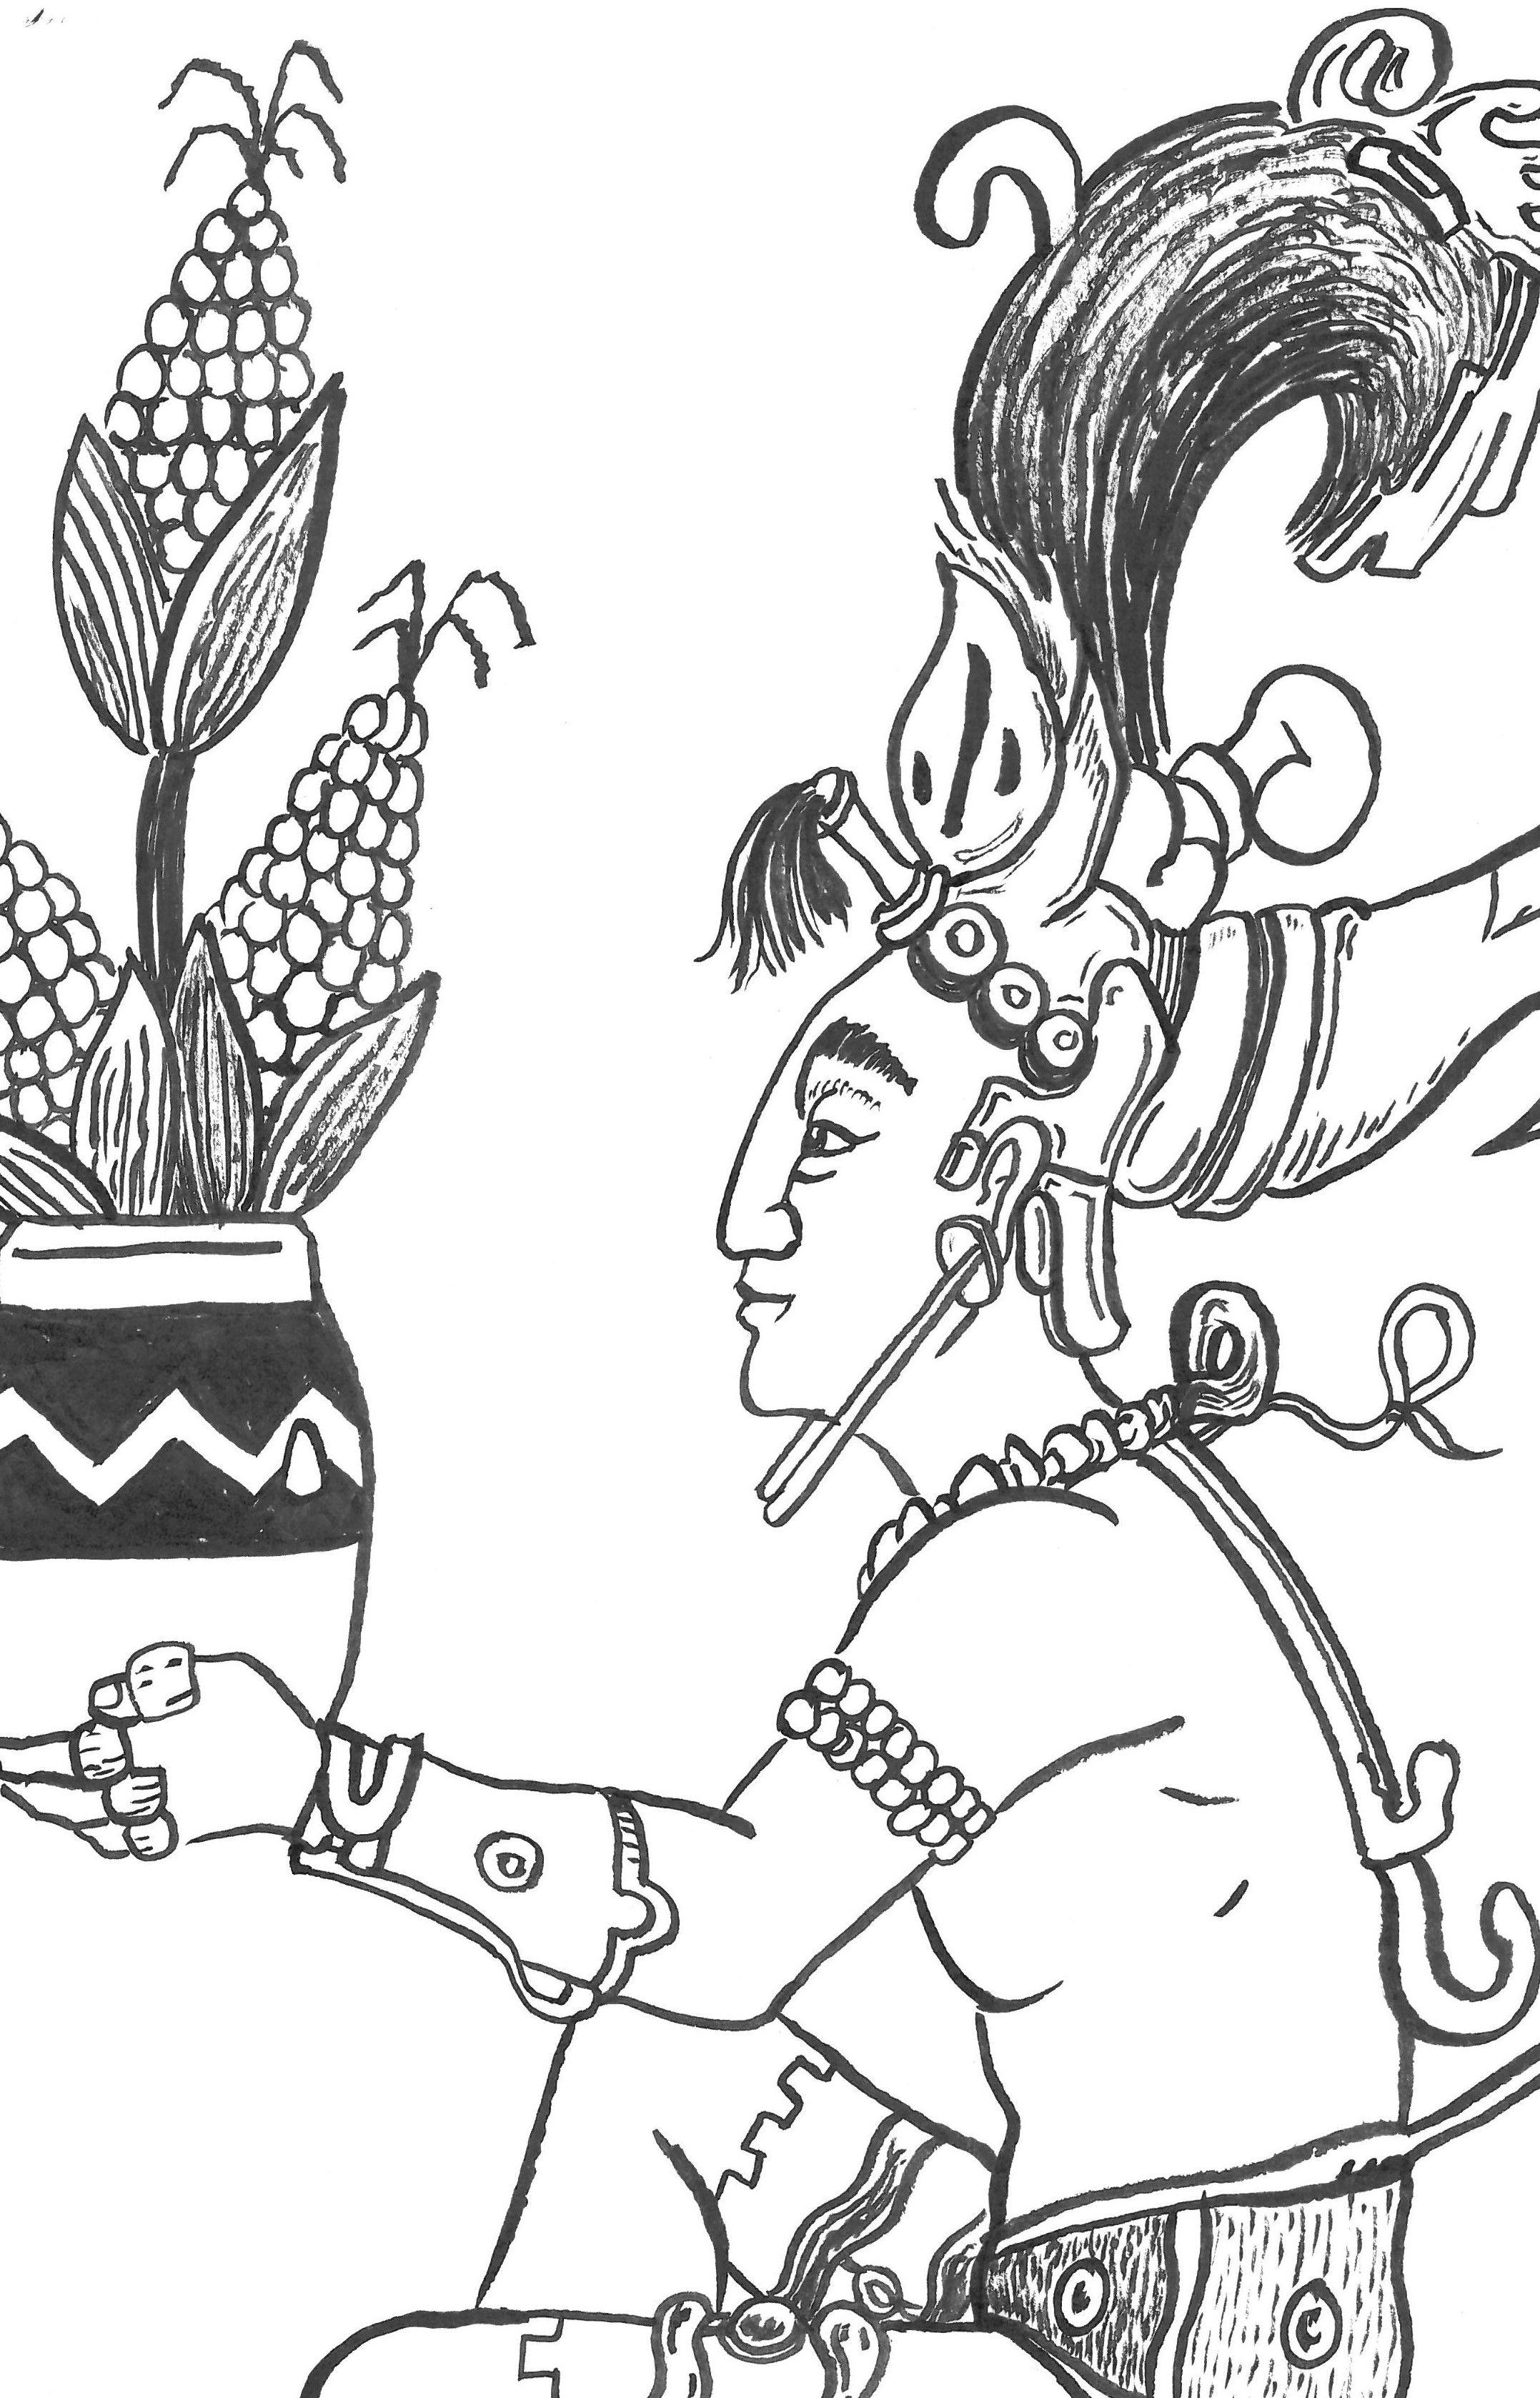 Centeotl Reinterpretacion Dibujo Hecho Para Tamaleria Nicte Ha En Cholula Puebla Toltecas Aztecas Deidades